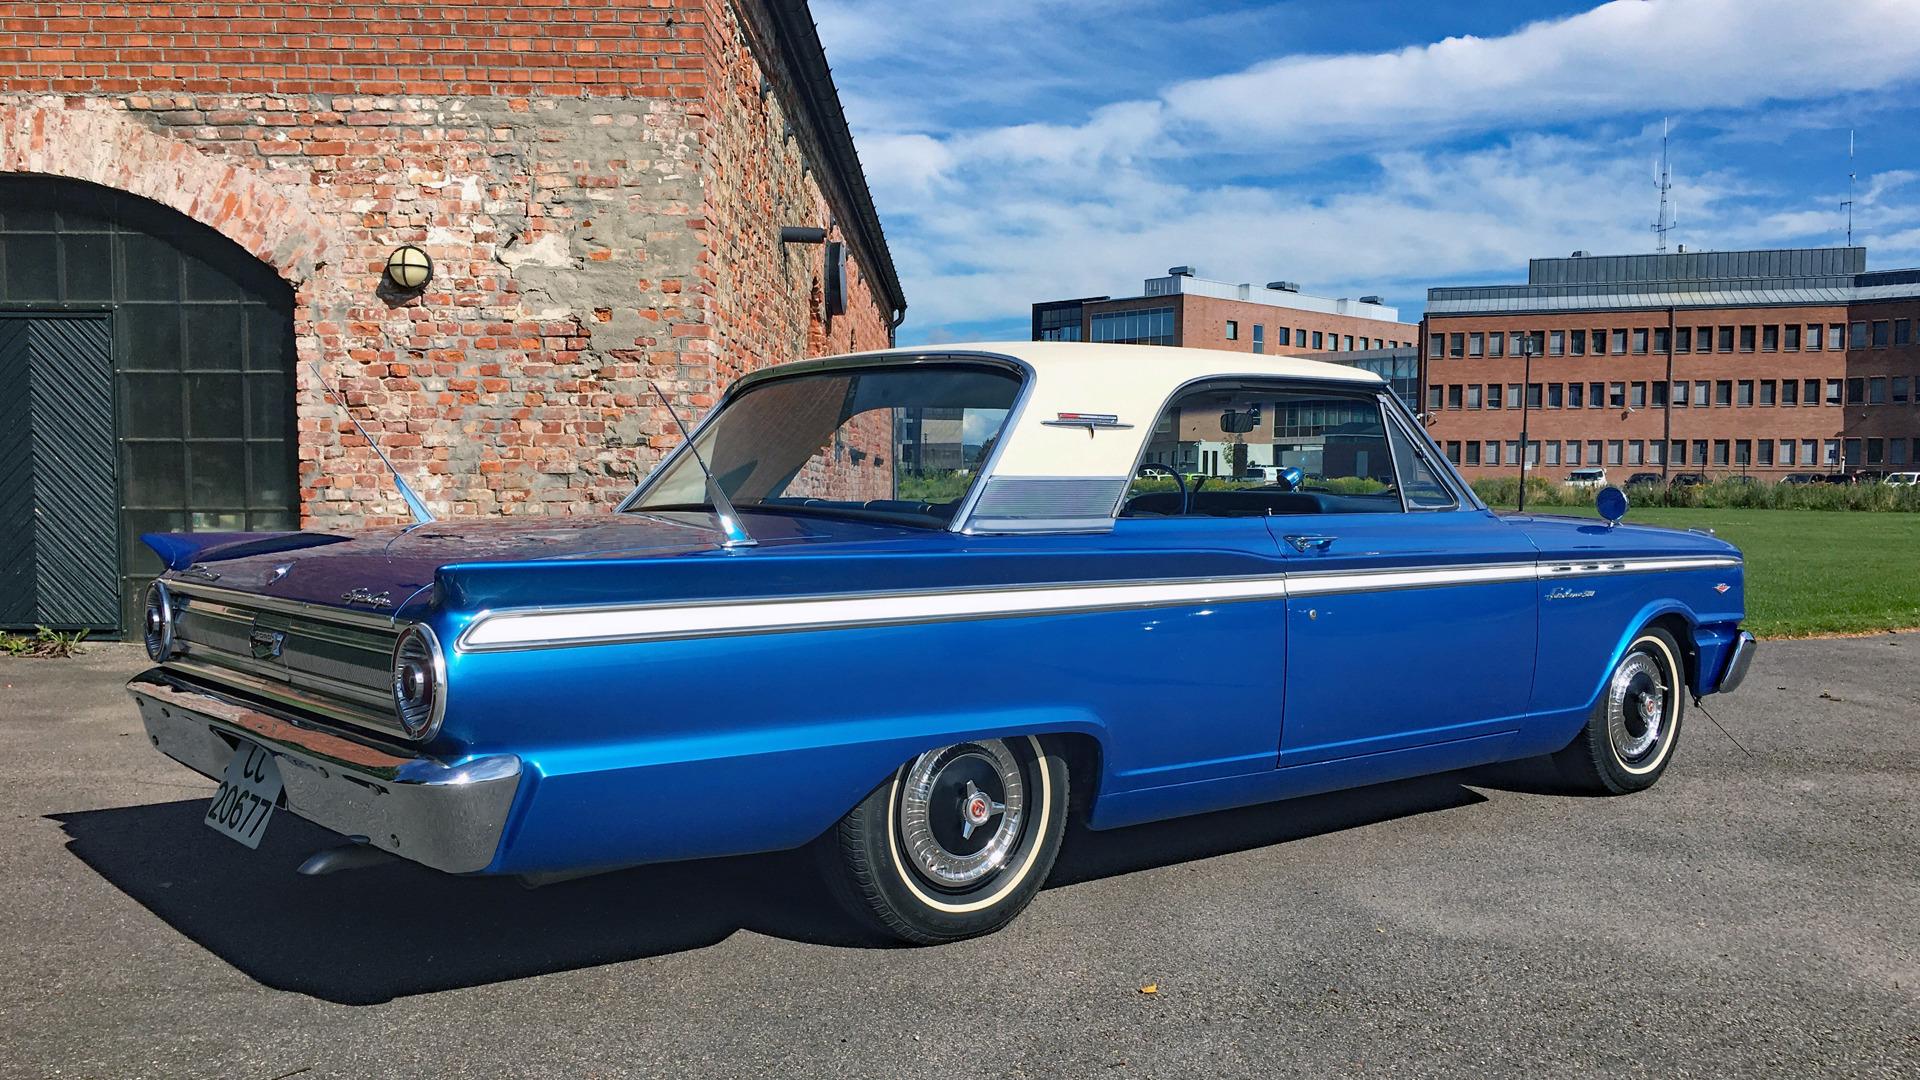 184-1963 Ford Fairlane 500 Sports Coupe 02. Eier-